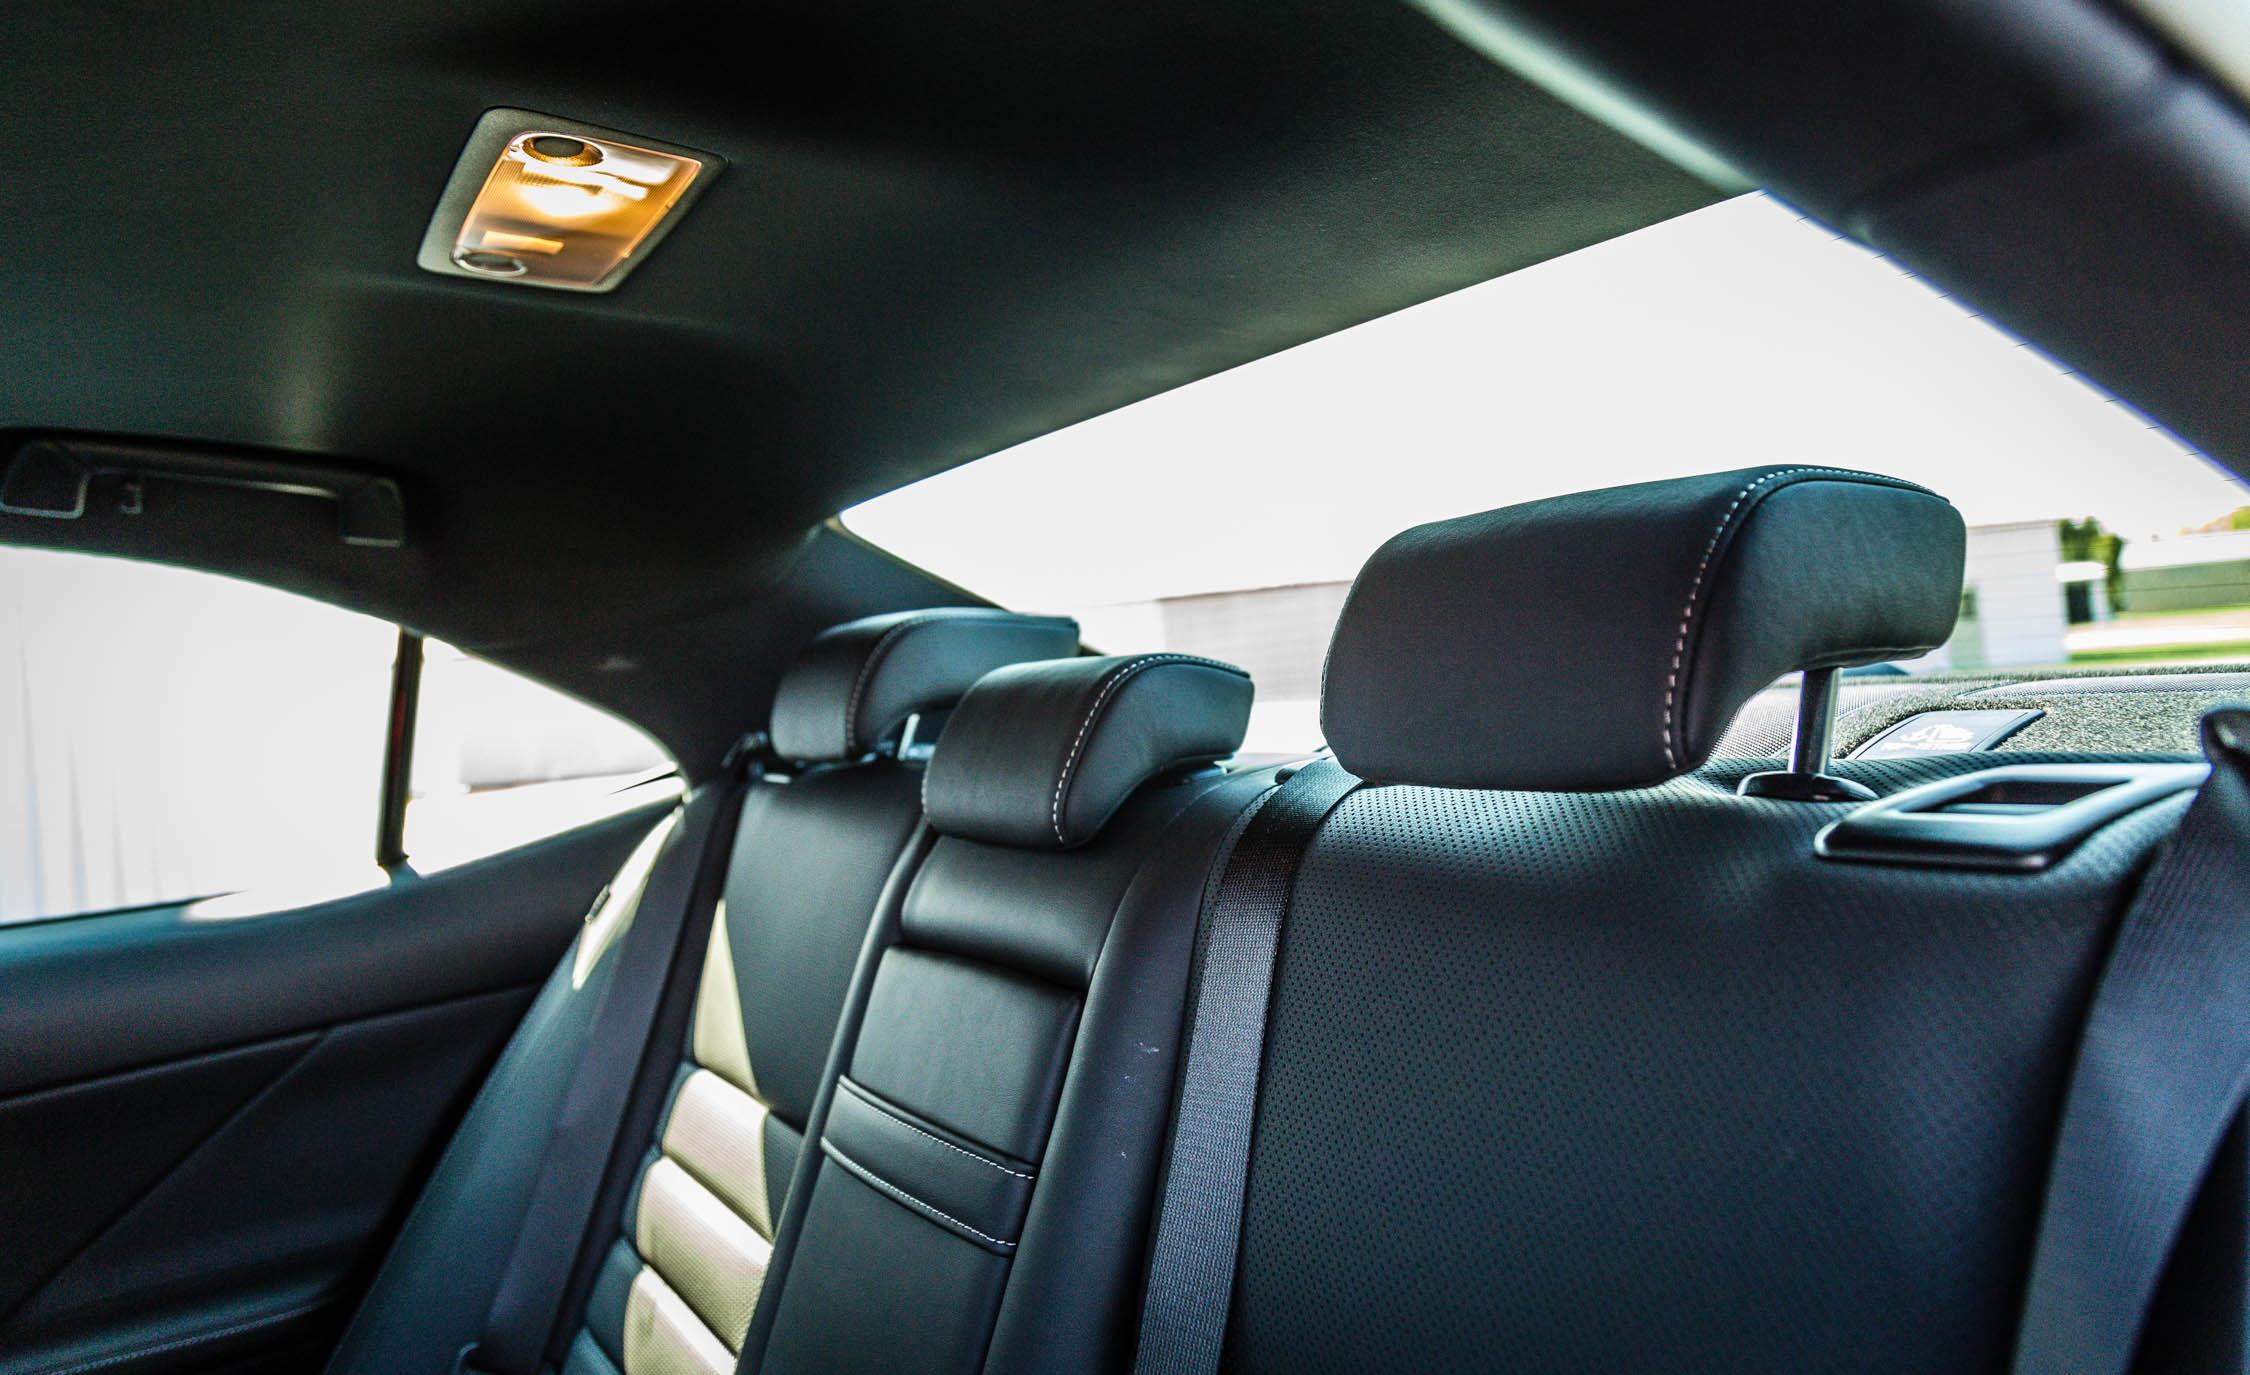 2017 Lexus IS 200t F Sport Interior Seats Rear Headrest (View 28 of 29)